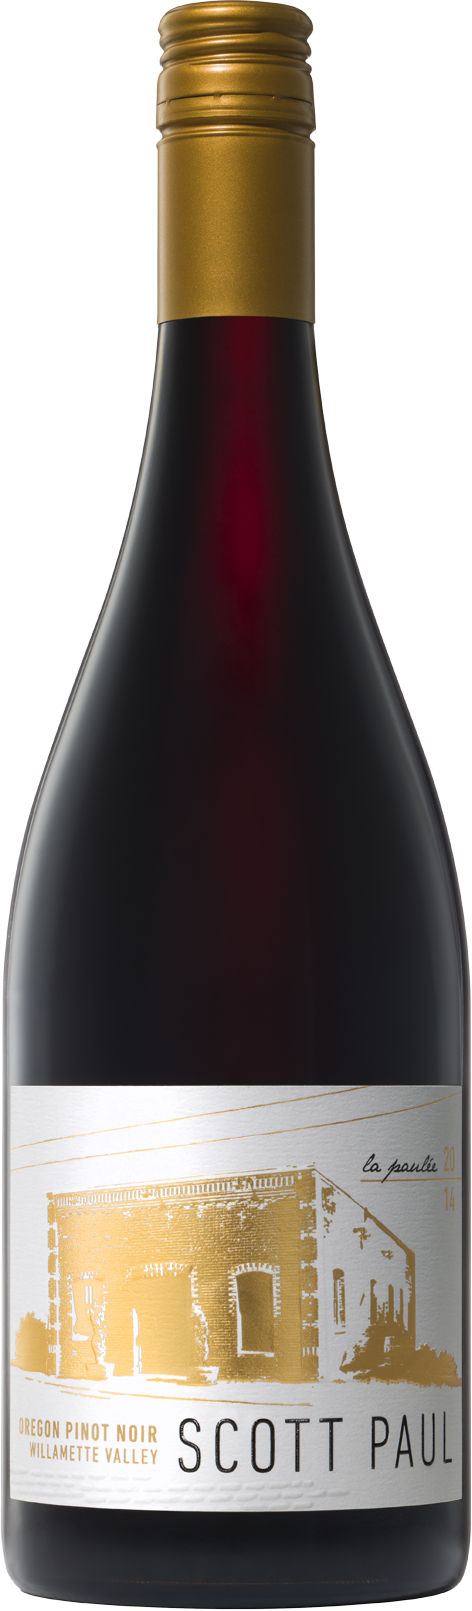 2014 Scott Paul - La Paulee Pinot Noir